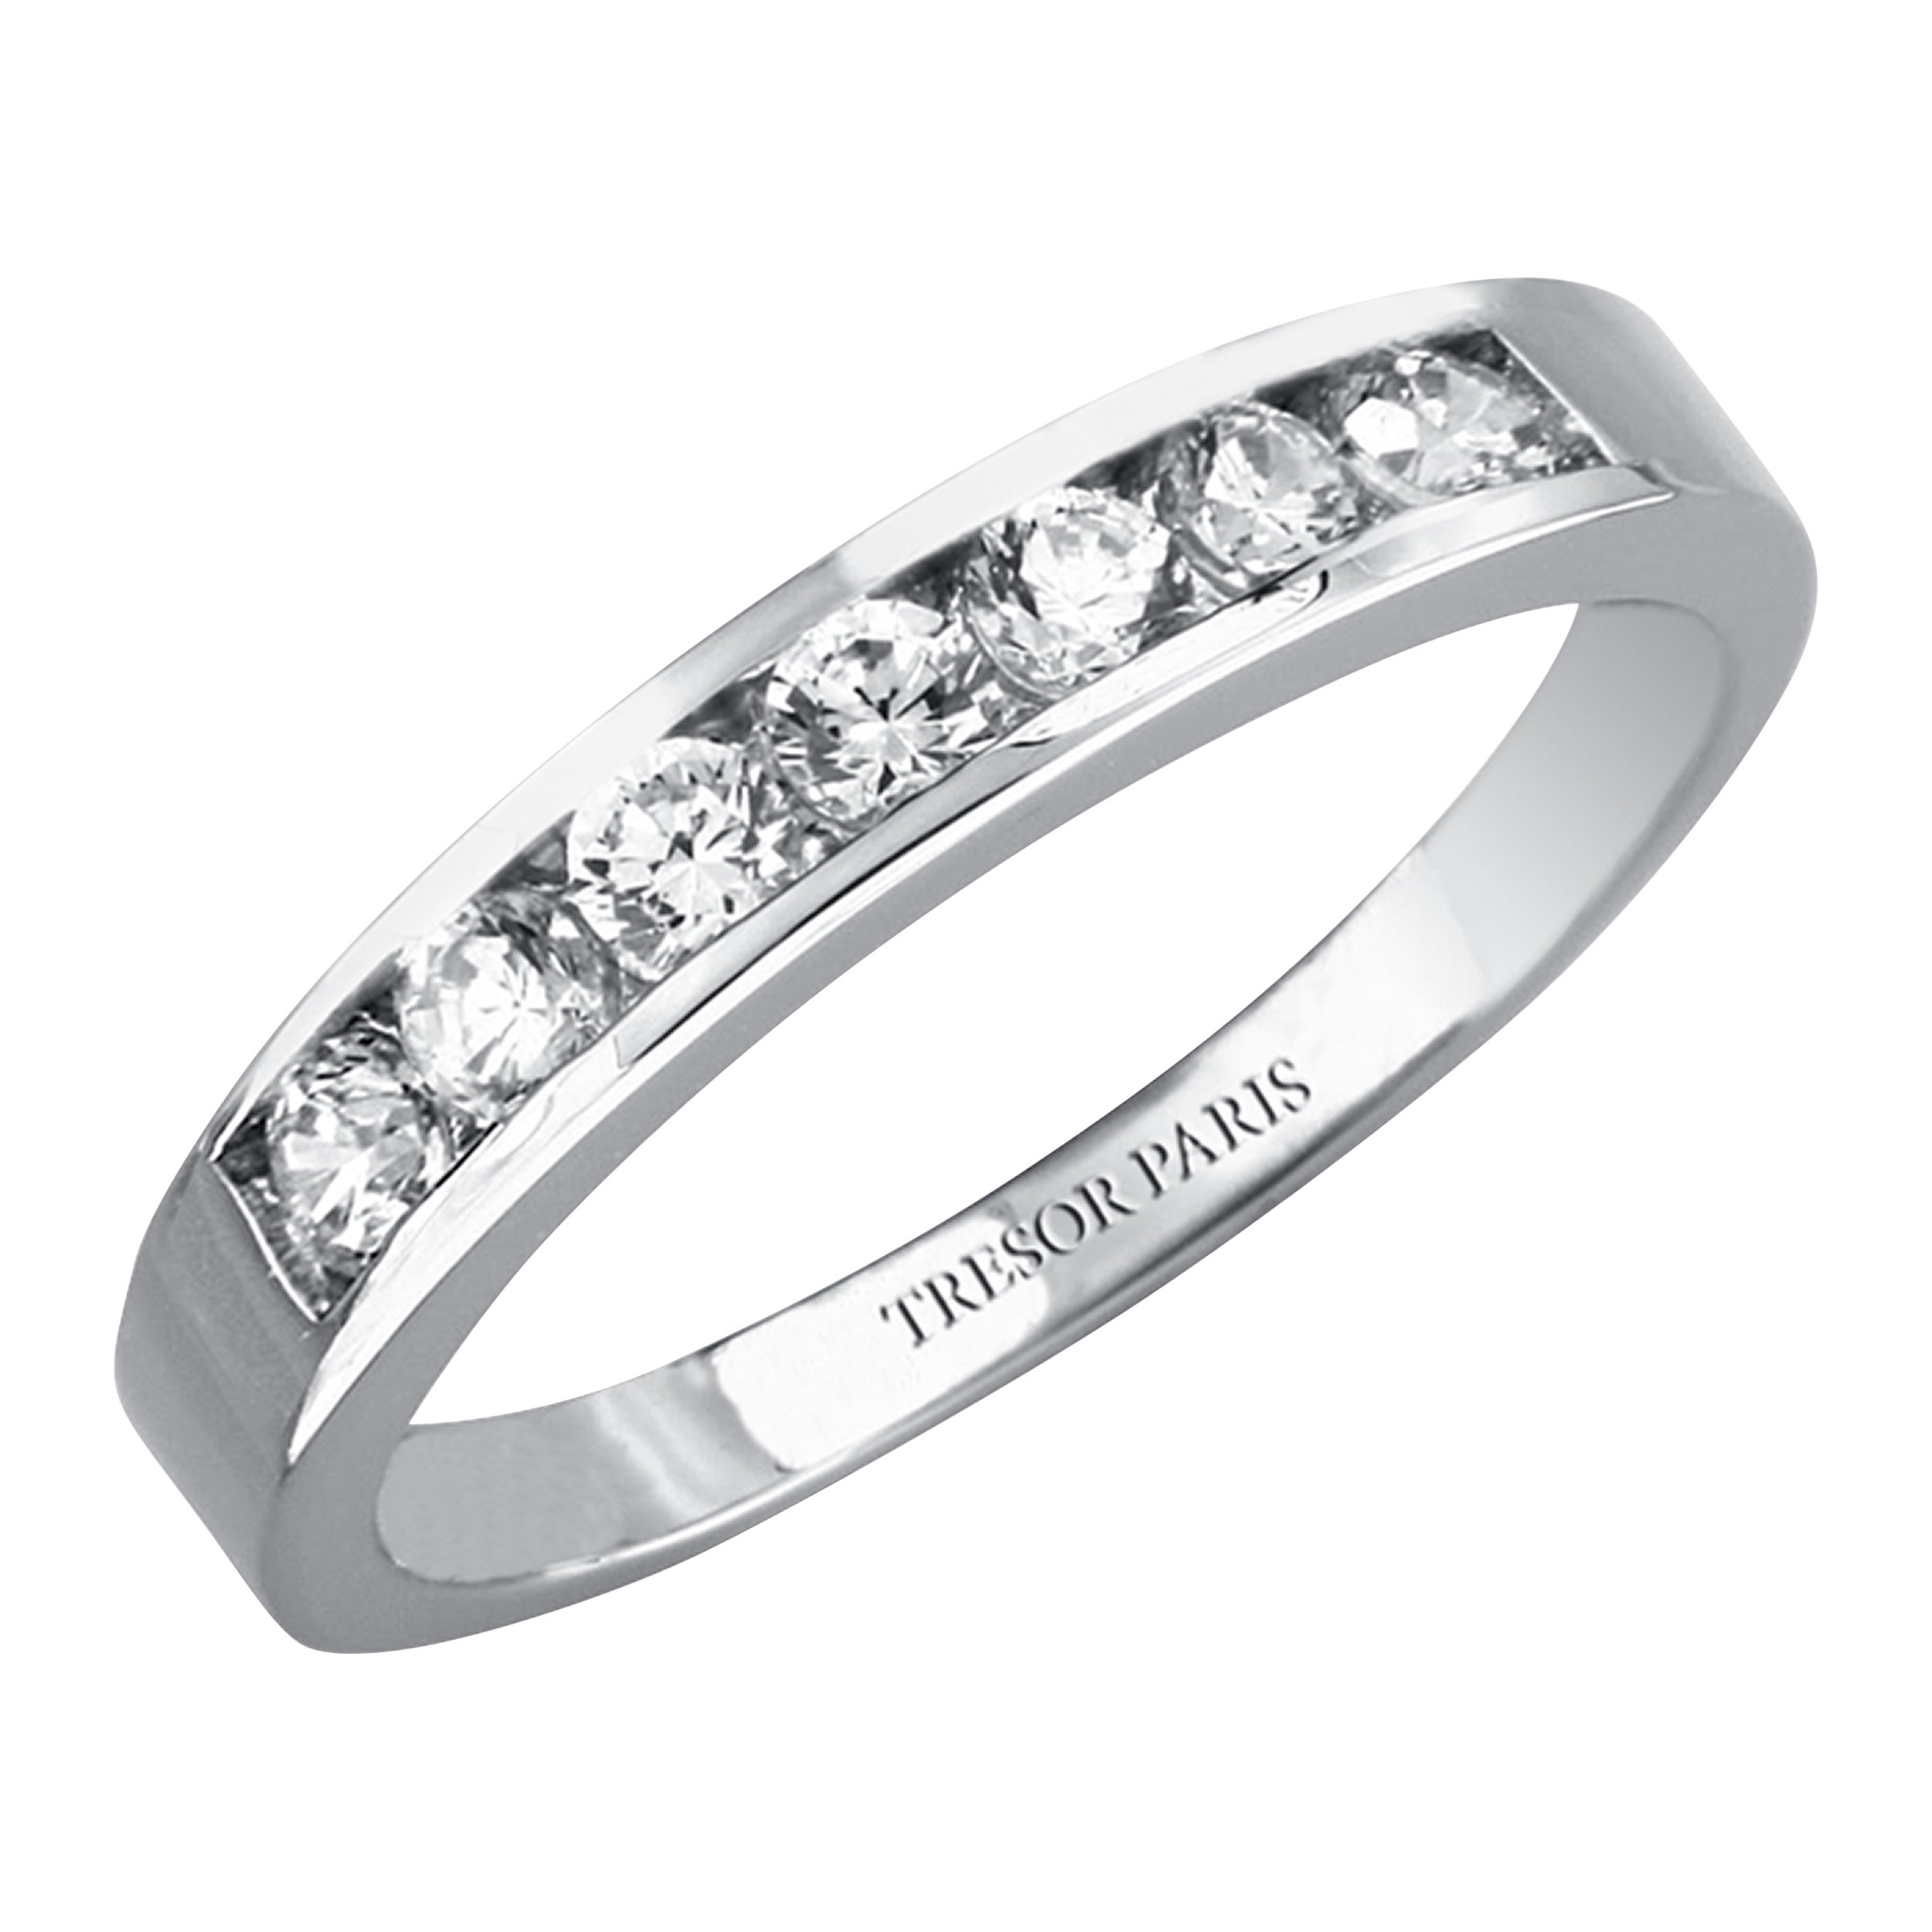 1.00 Carat Round Diamond Channel Set Half Eternity Band Ring 18 Karat White Gold